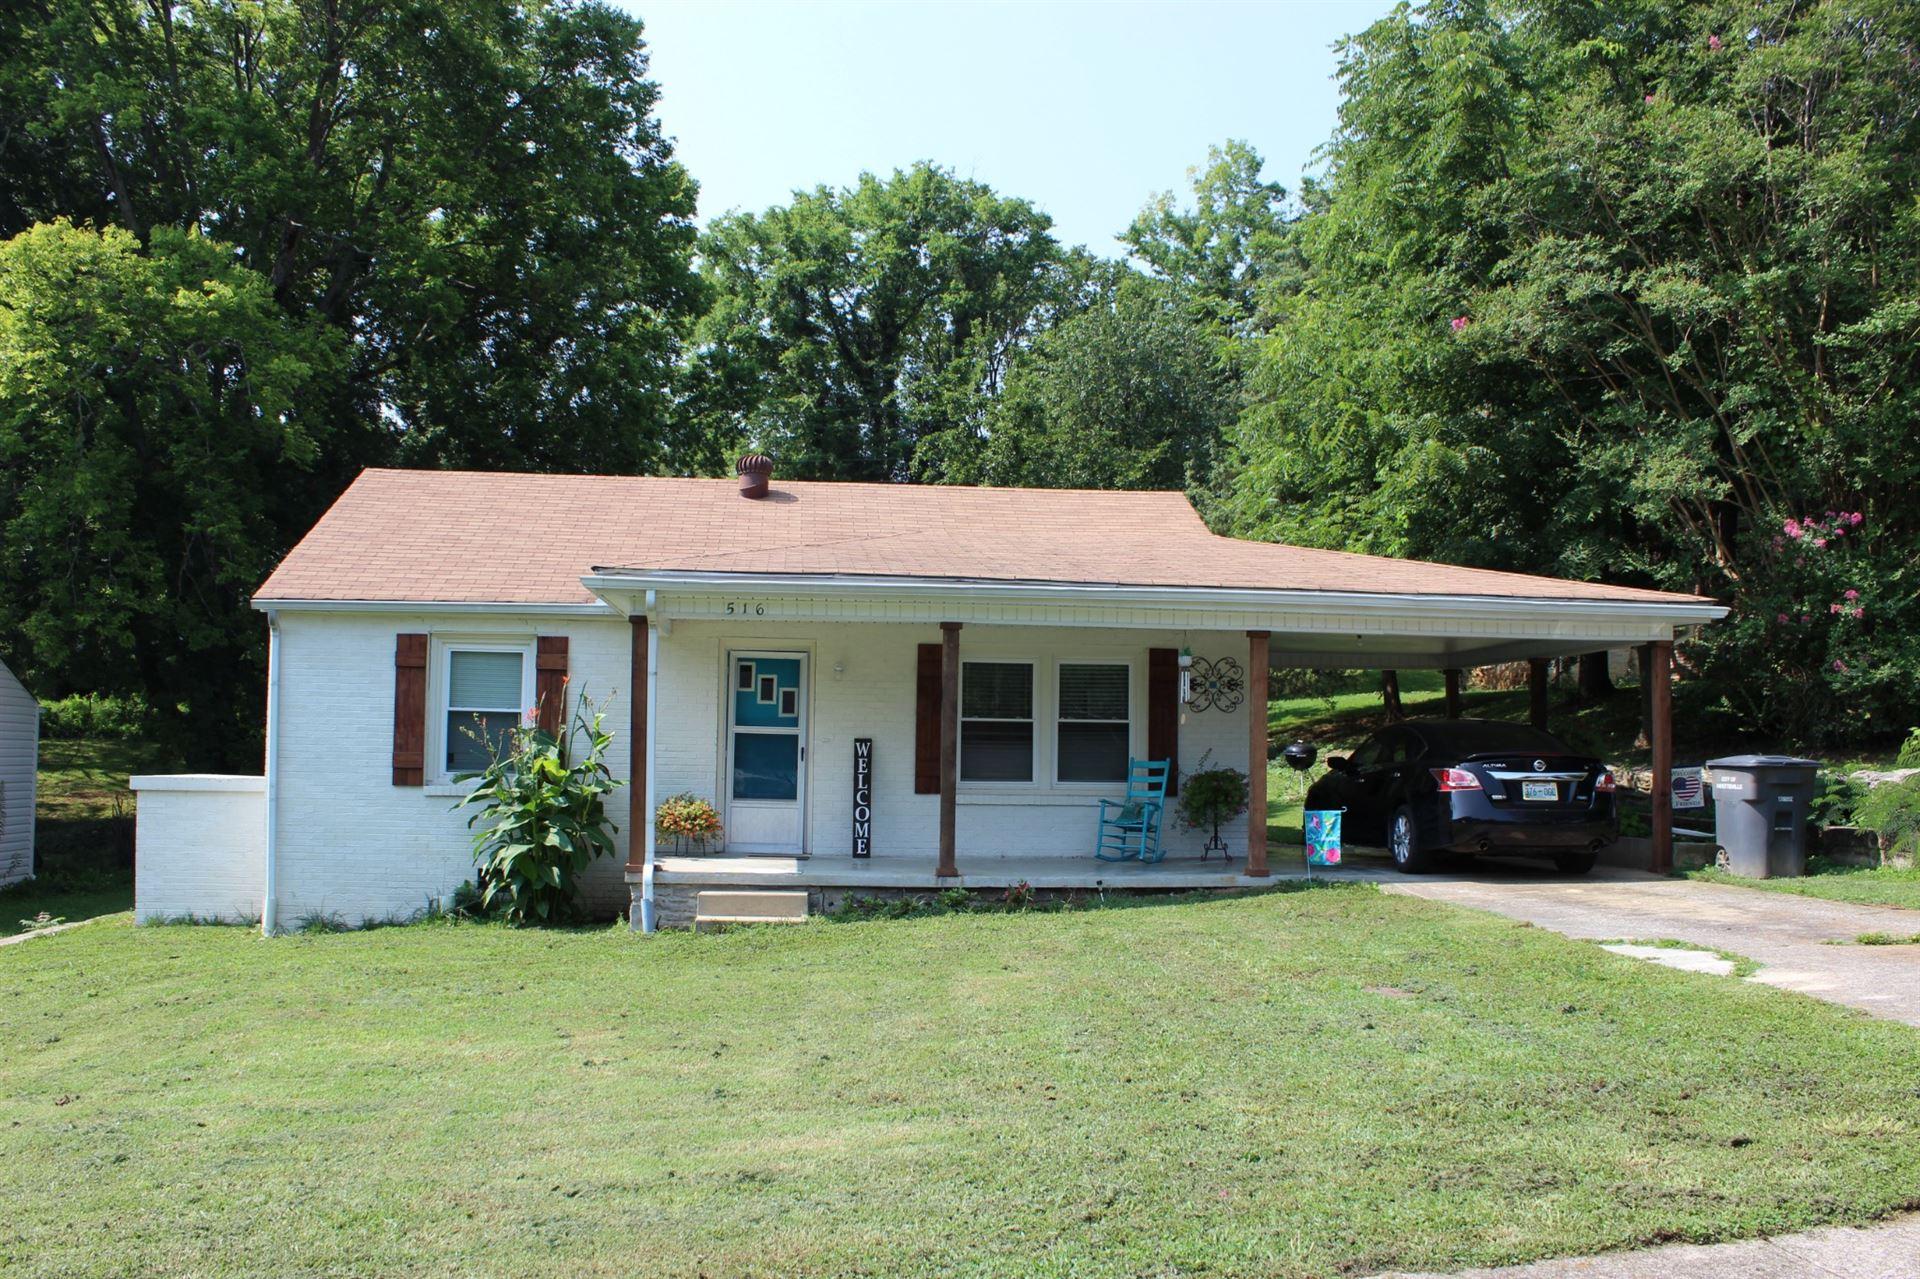 Photo of 516 Hatcher Dr, Fayetteville, TN 37334 (MLS # 2275659)